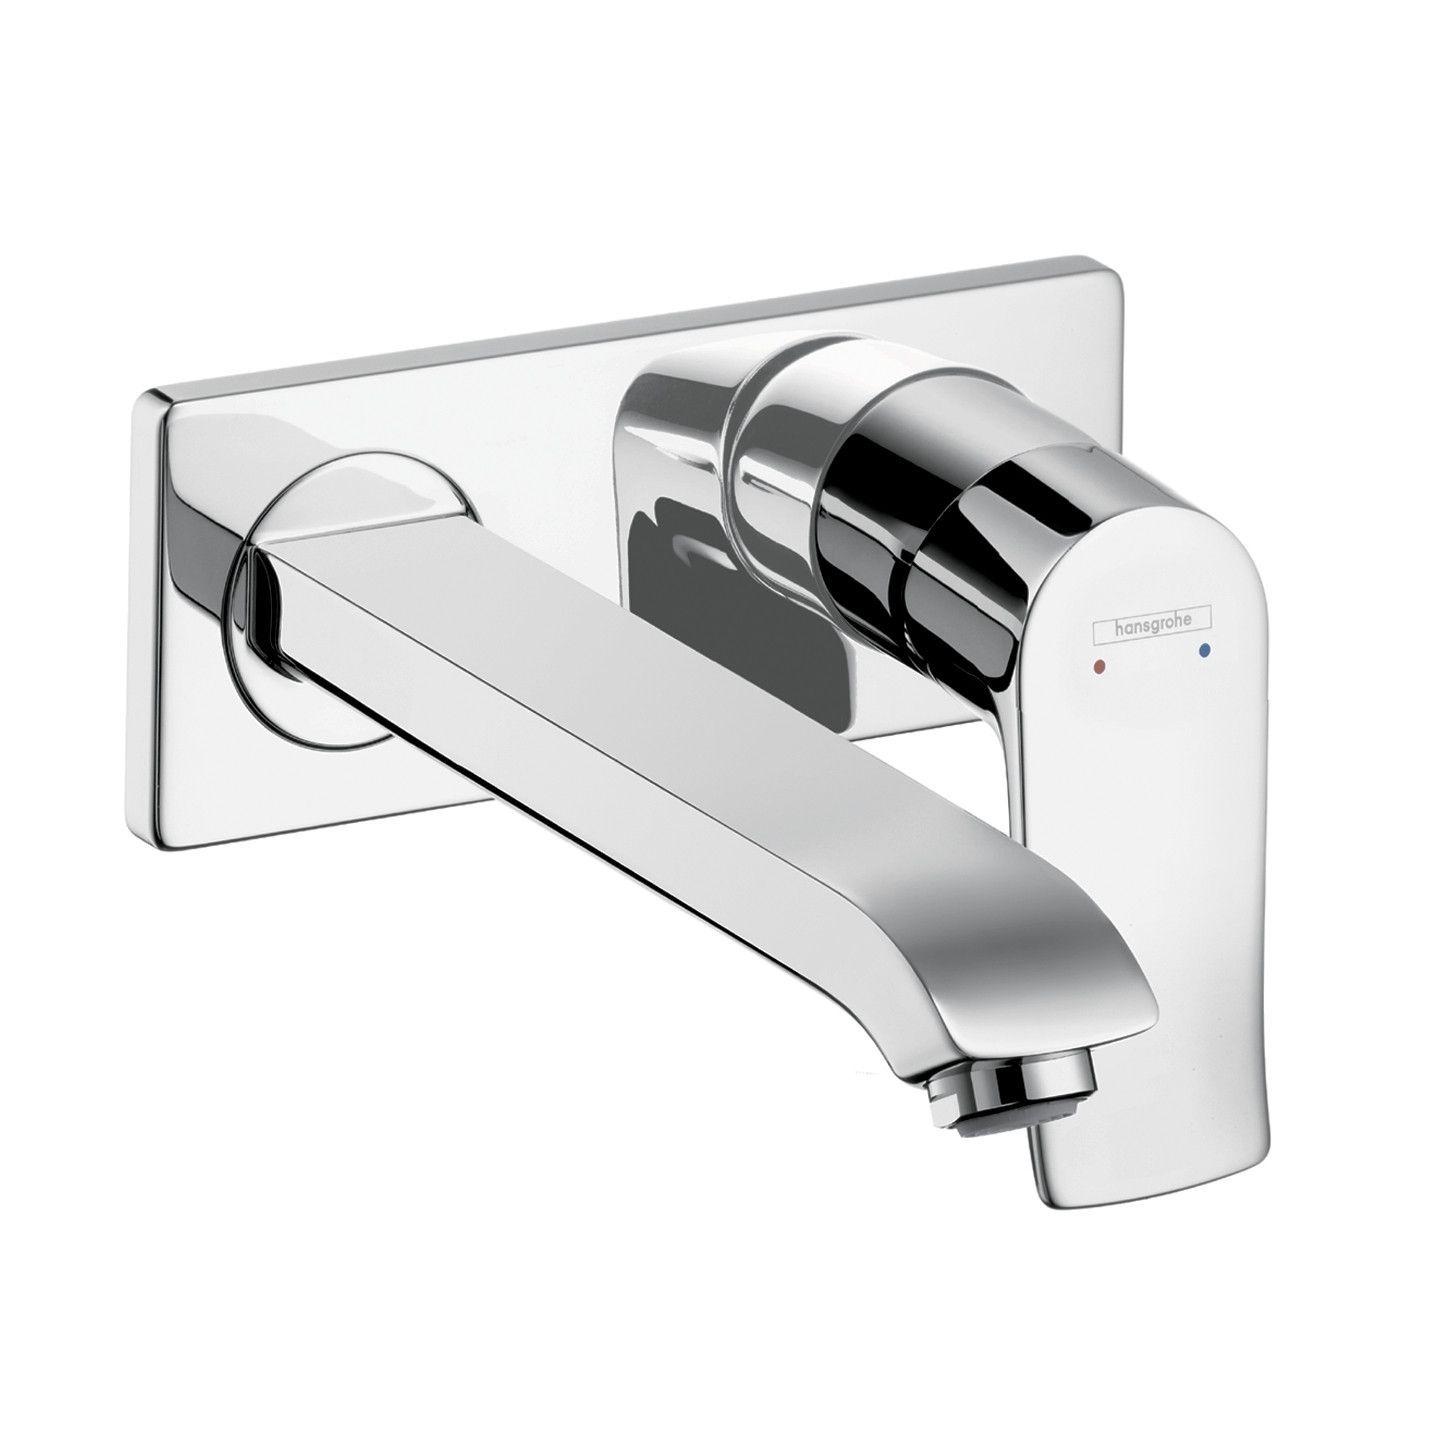 Hansgrohe 31086001 Chrome Metris Wall Mounted Bathroom Faucet ...